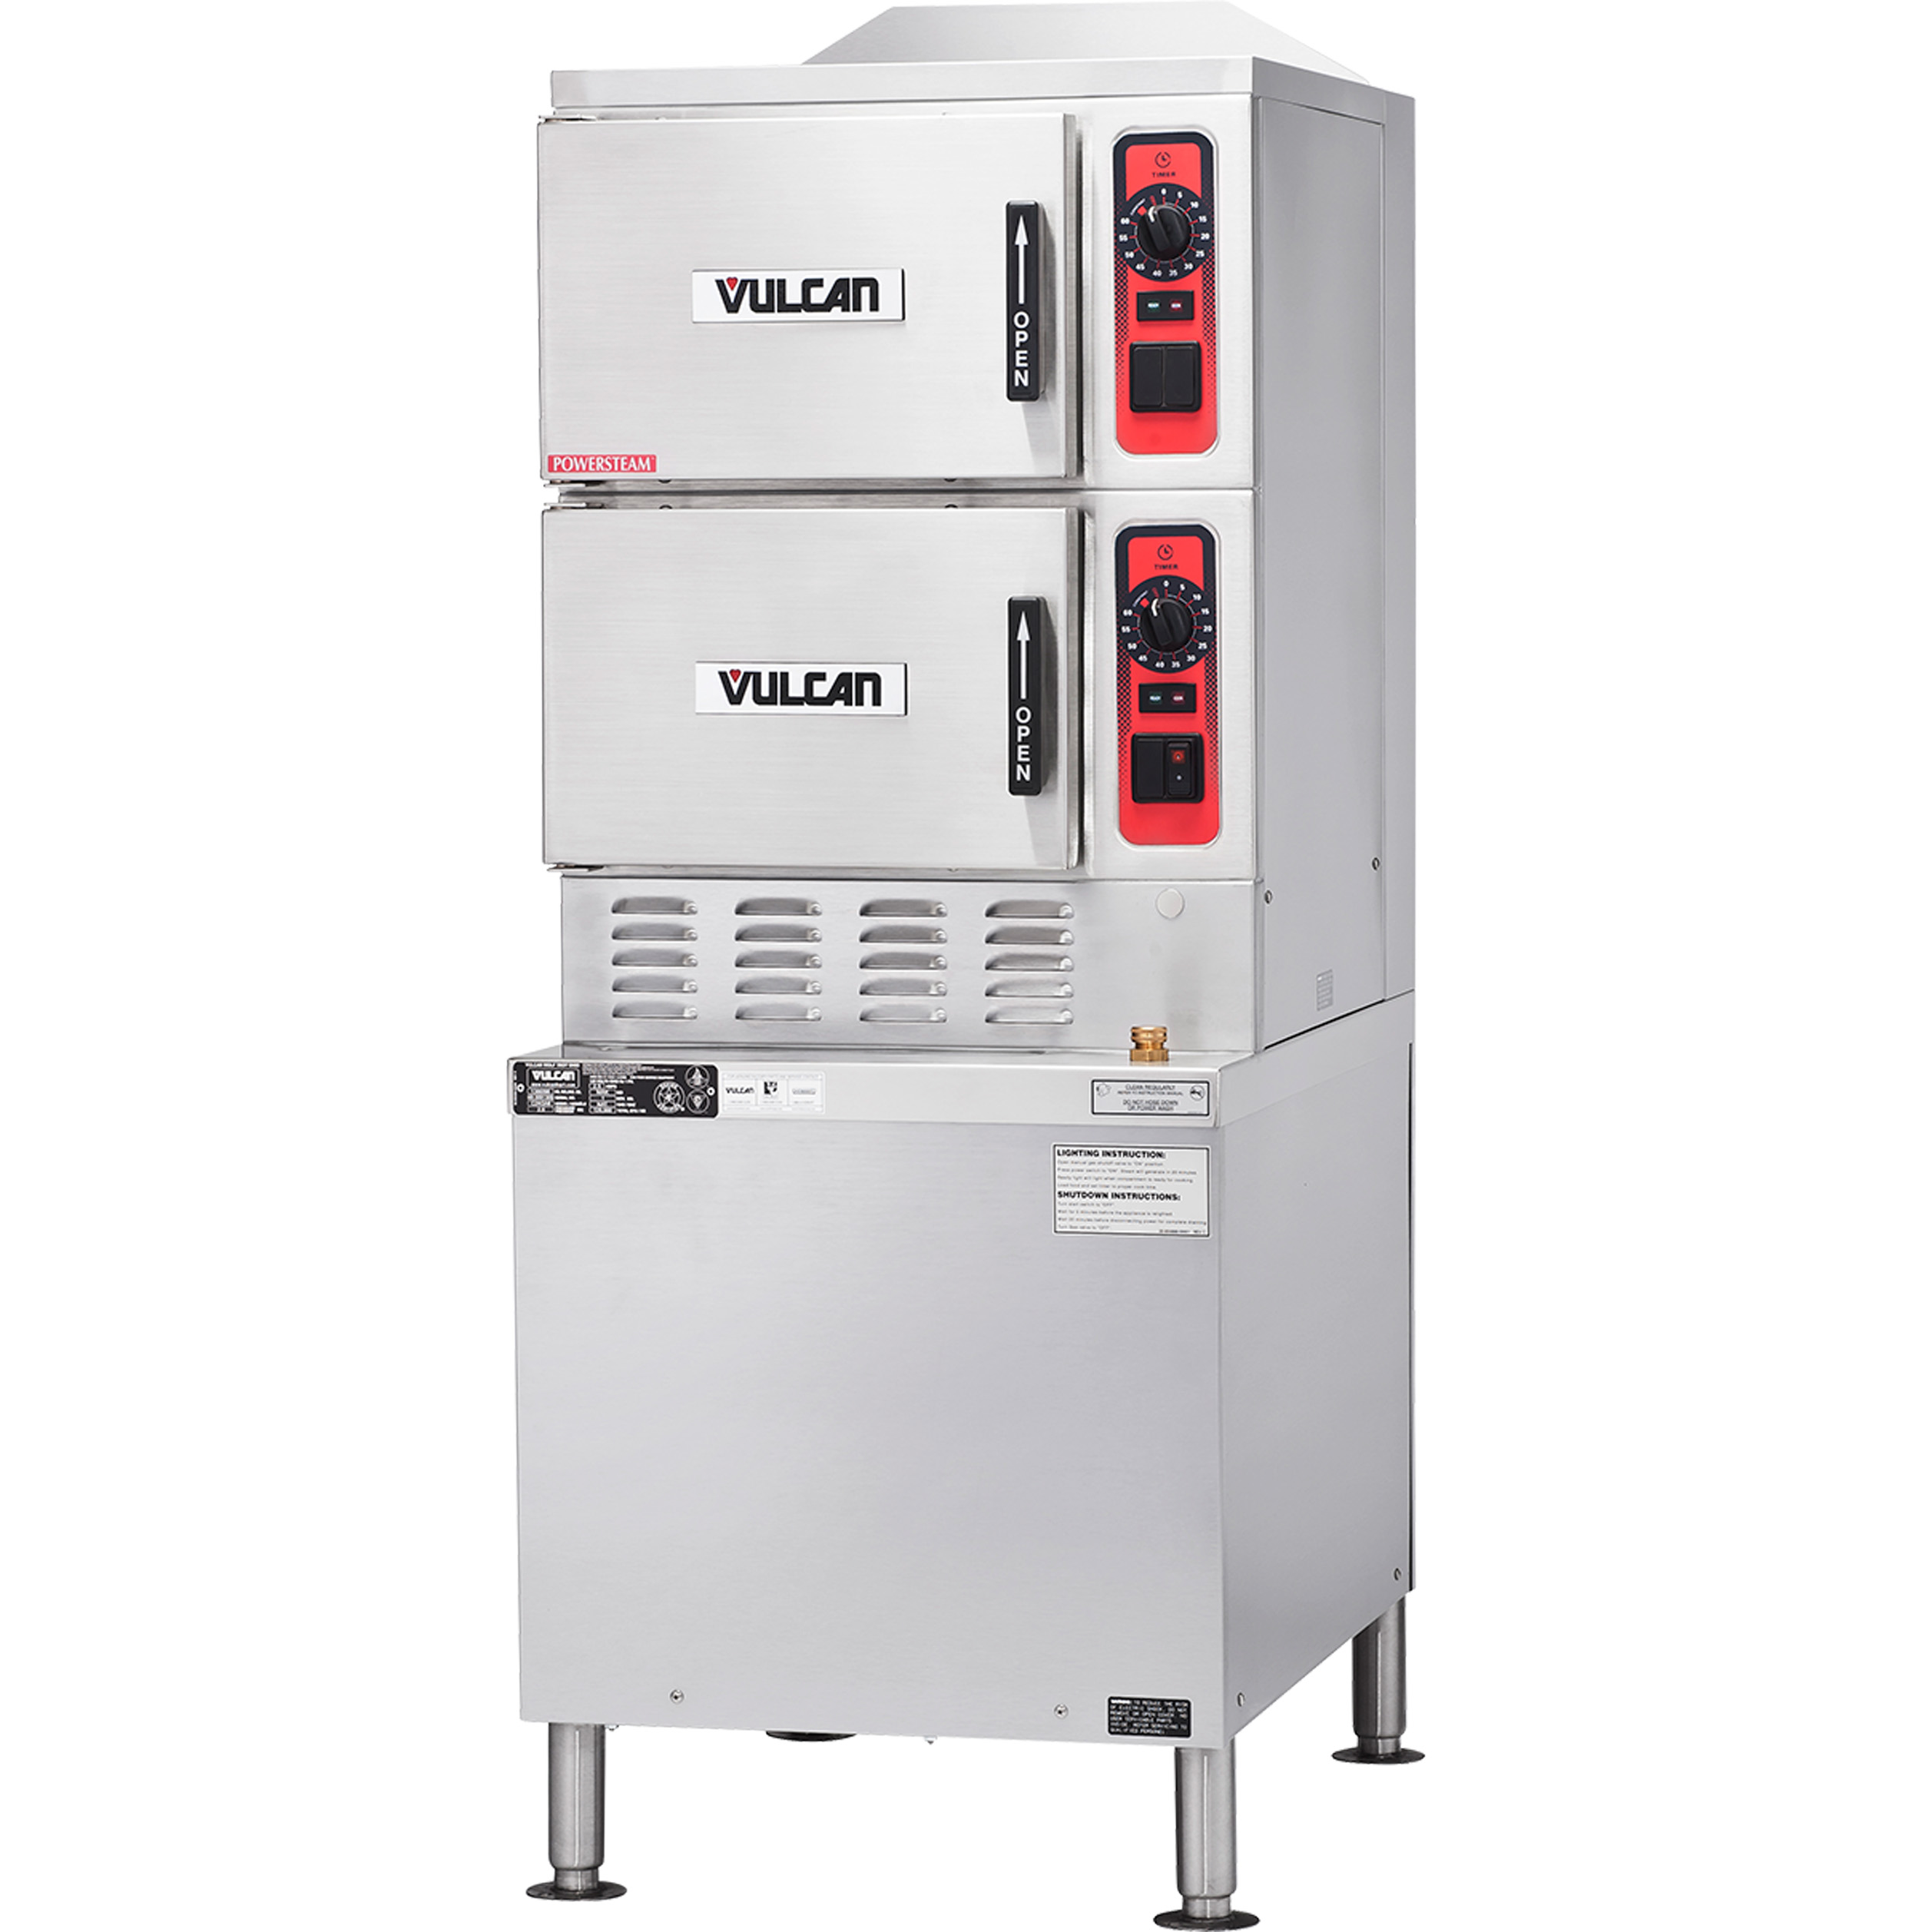 Vulcan Commercial Kitchen Equipment